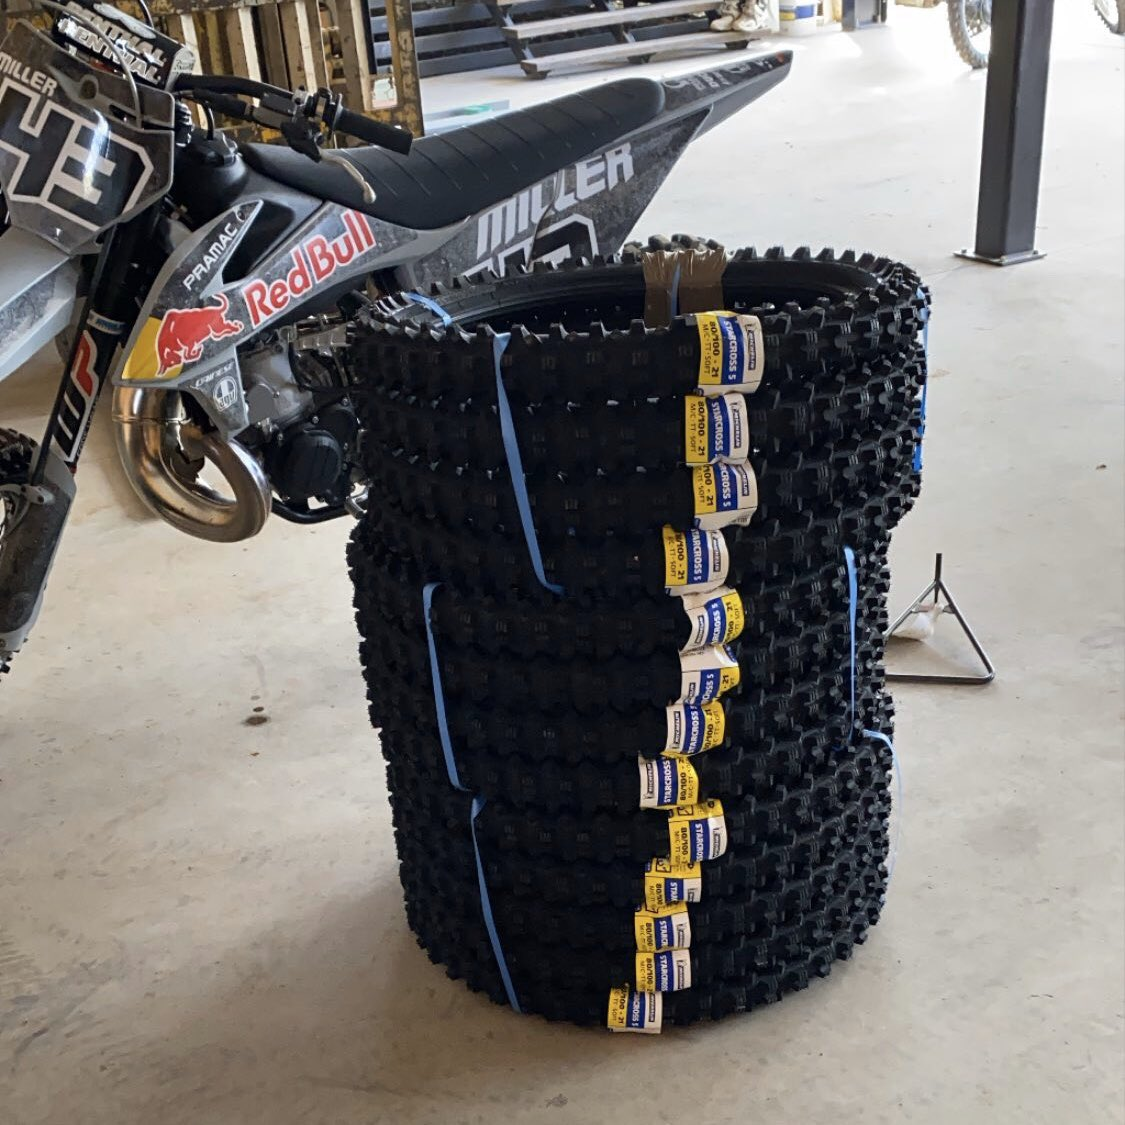 Bang!  Thank you @Michelin_Sport! #MichelinStarcross5 pic.twitter.com/CKJ2In5DcO